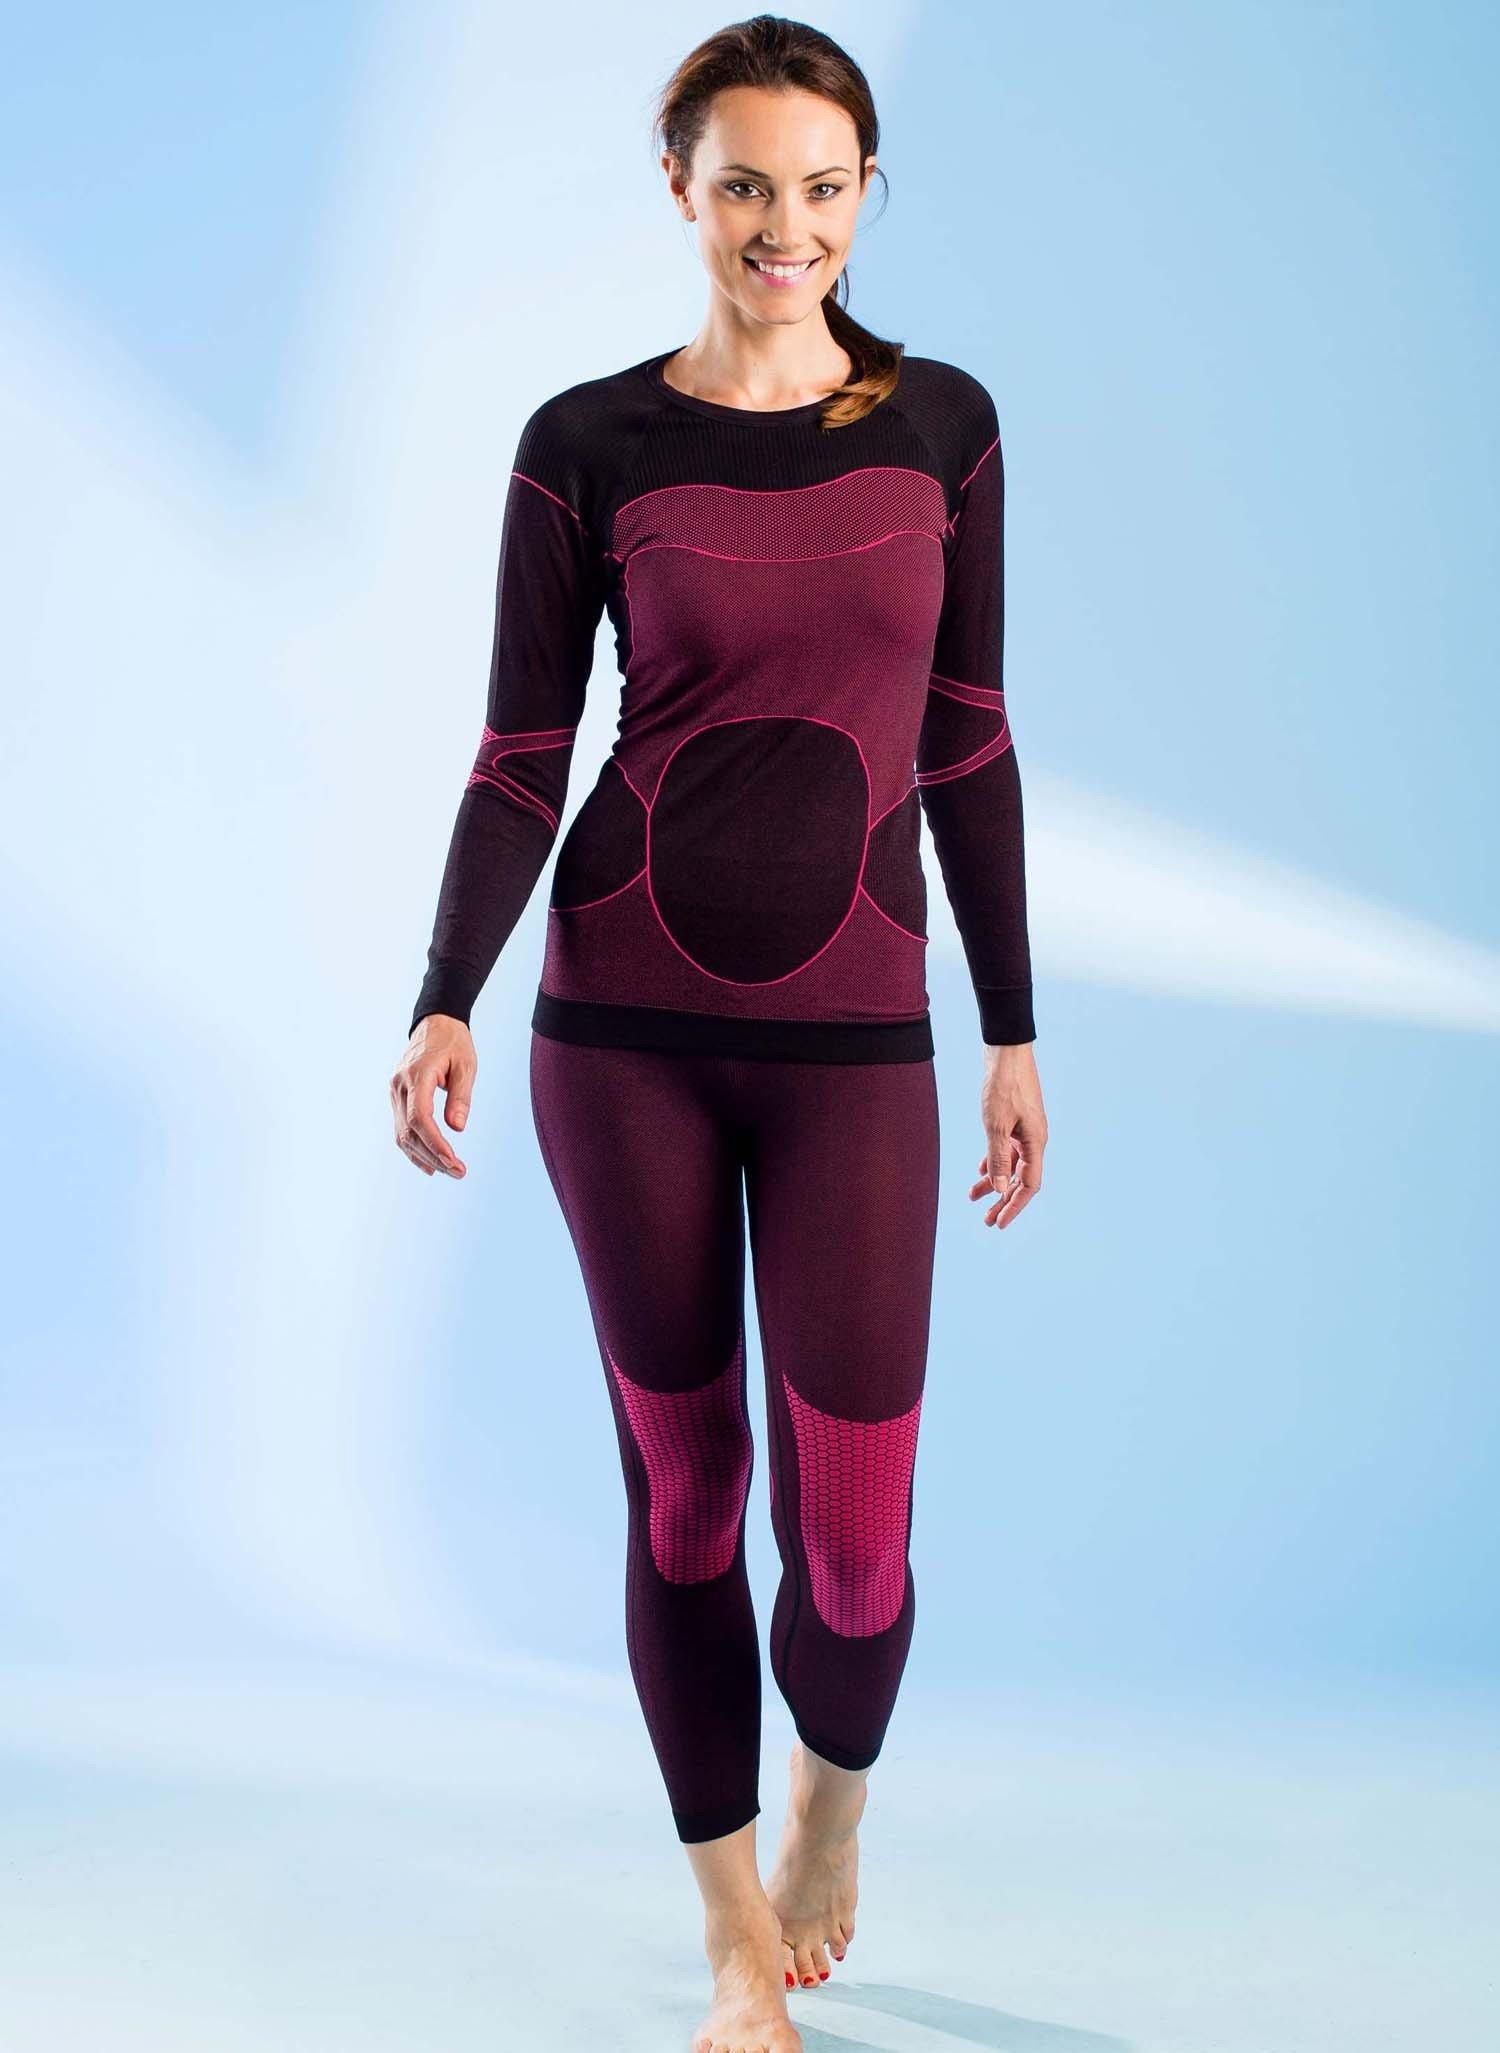 D-Pantalone-termico nero/pink